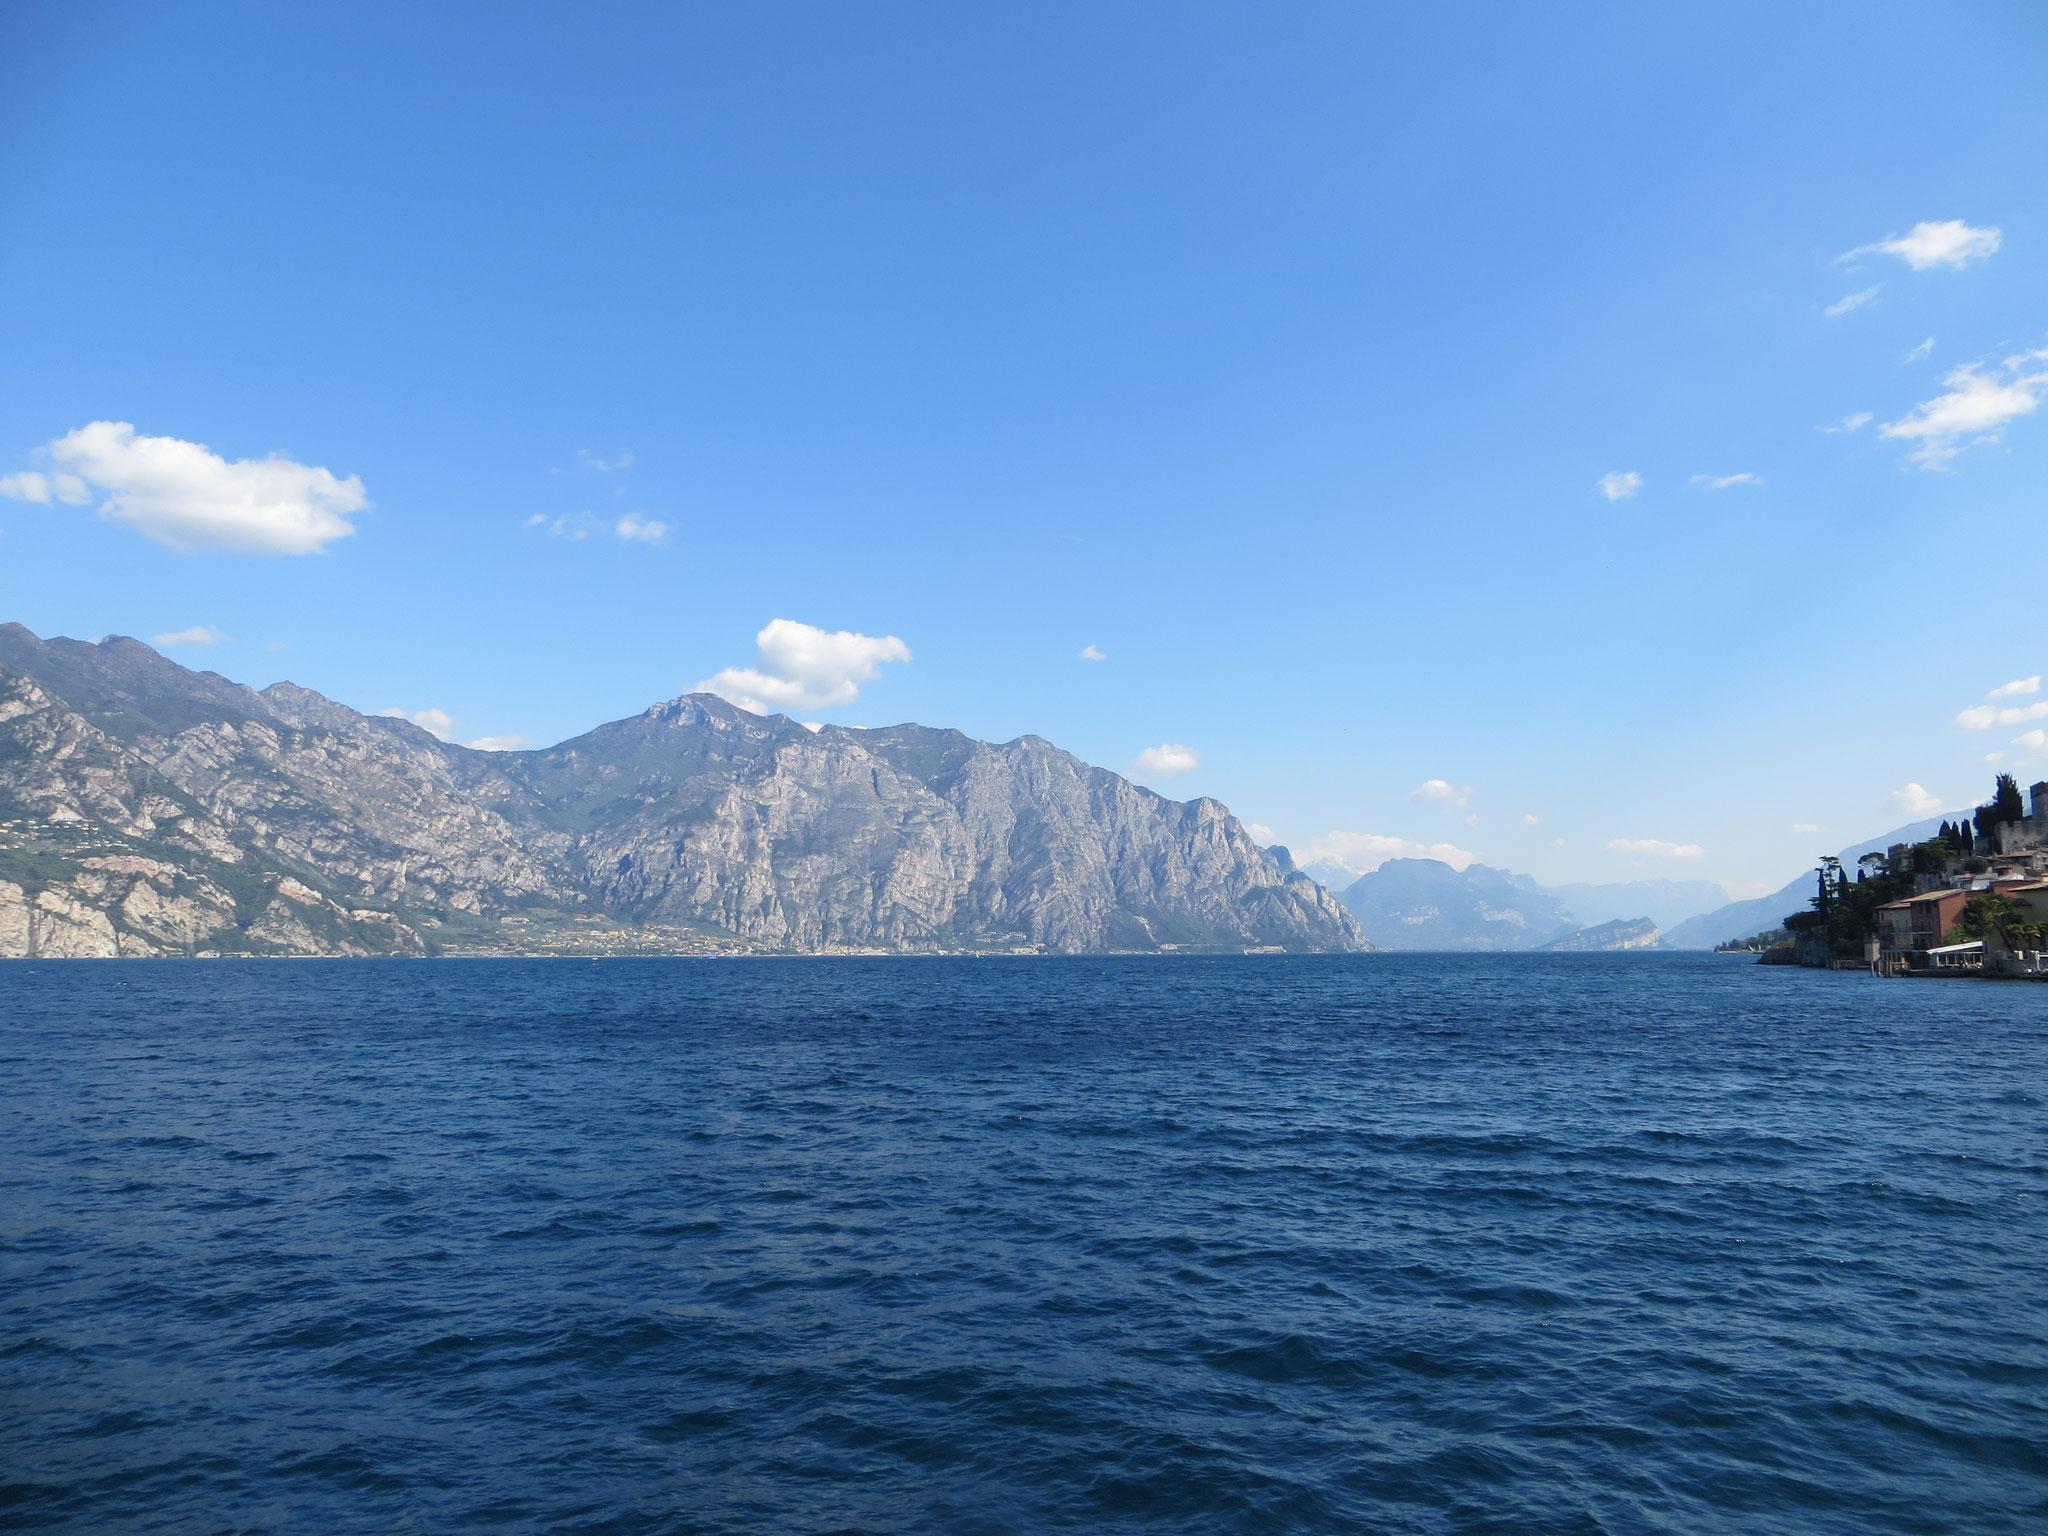 Blick nach Norden in Richtung Riva